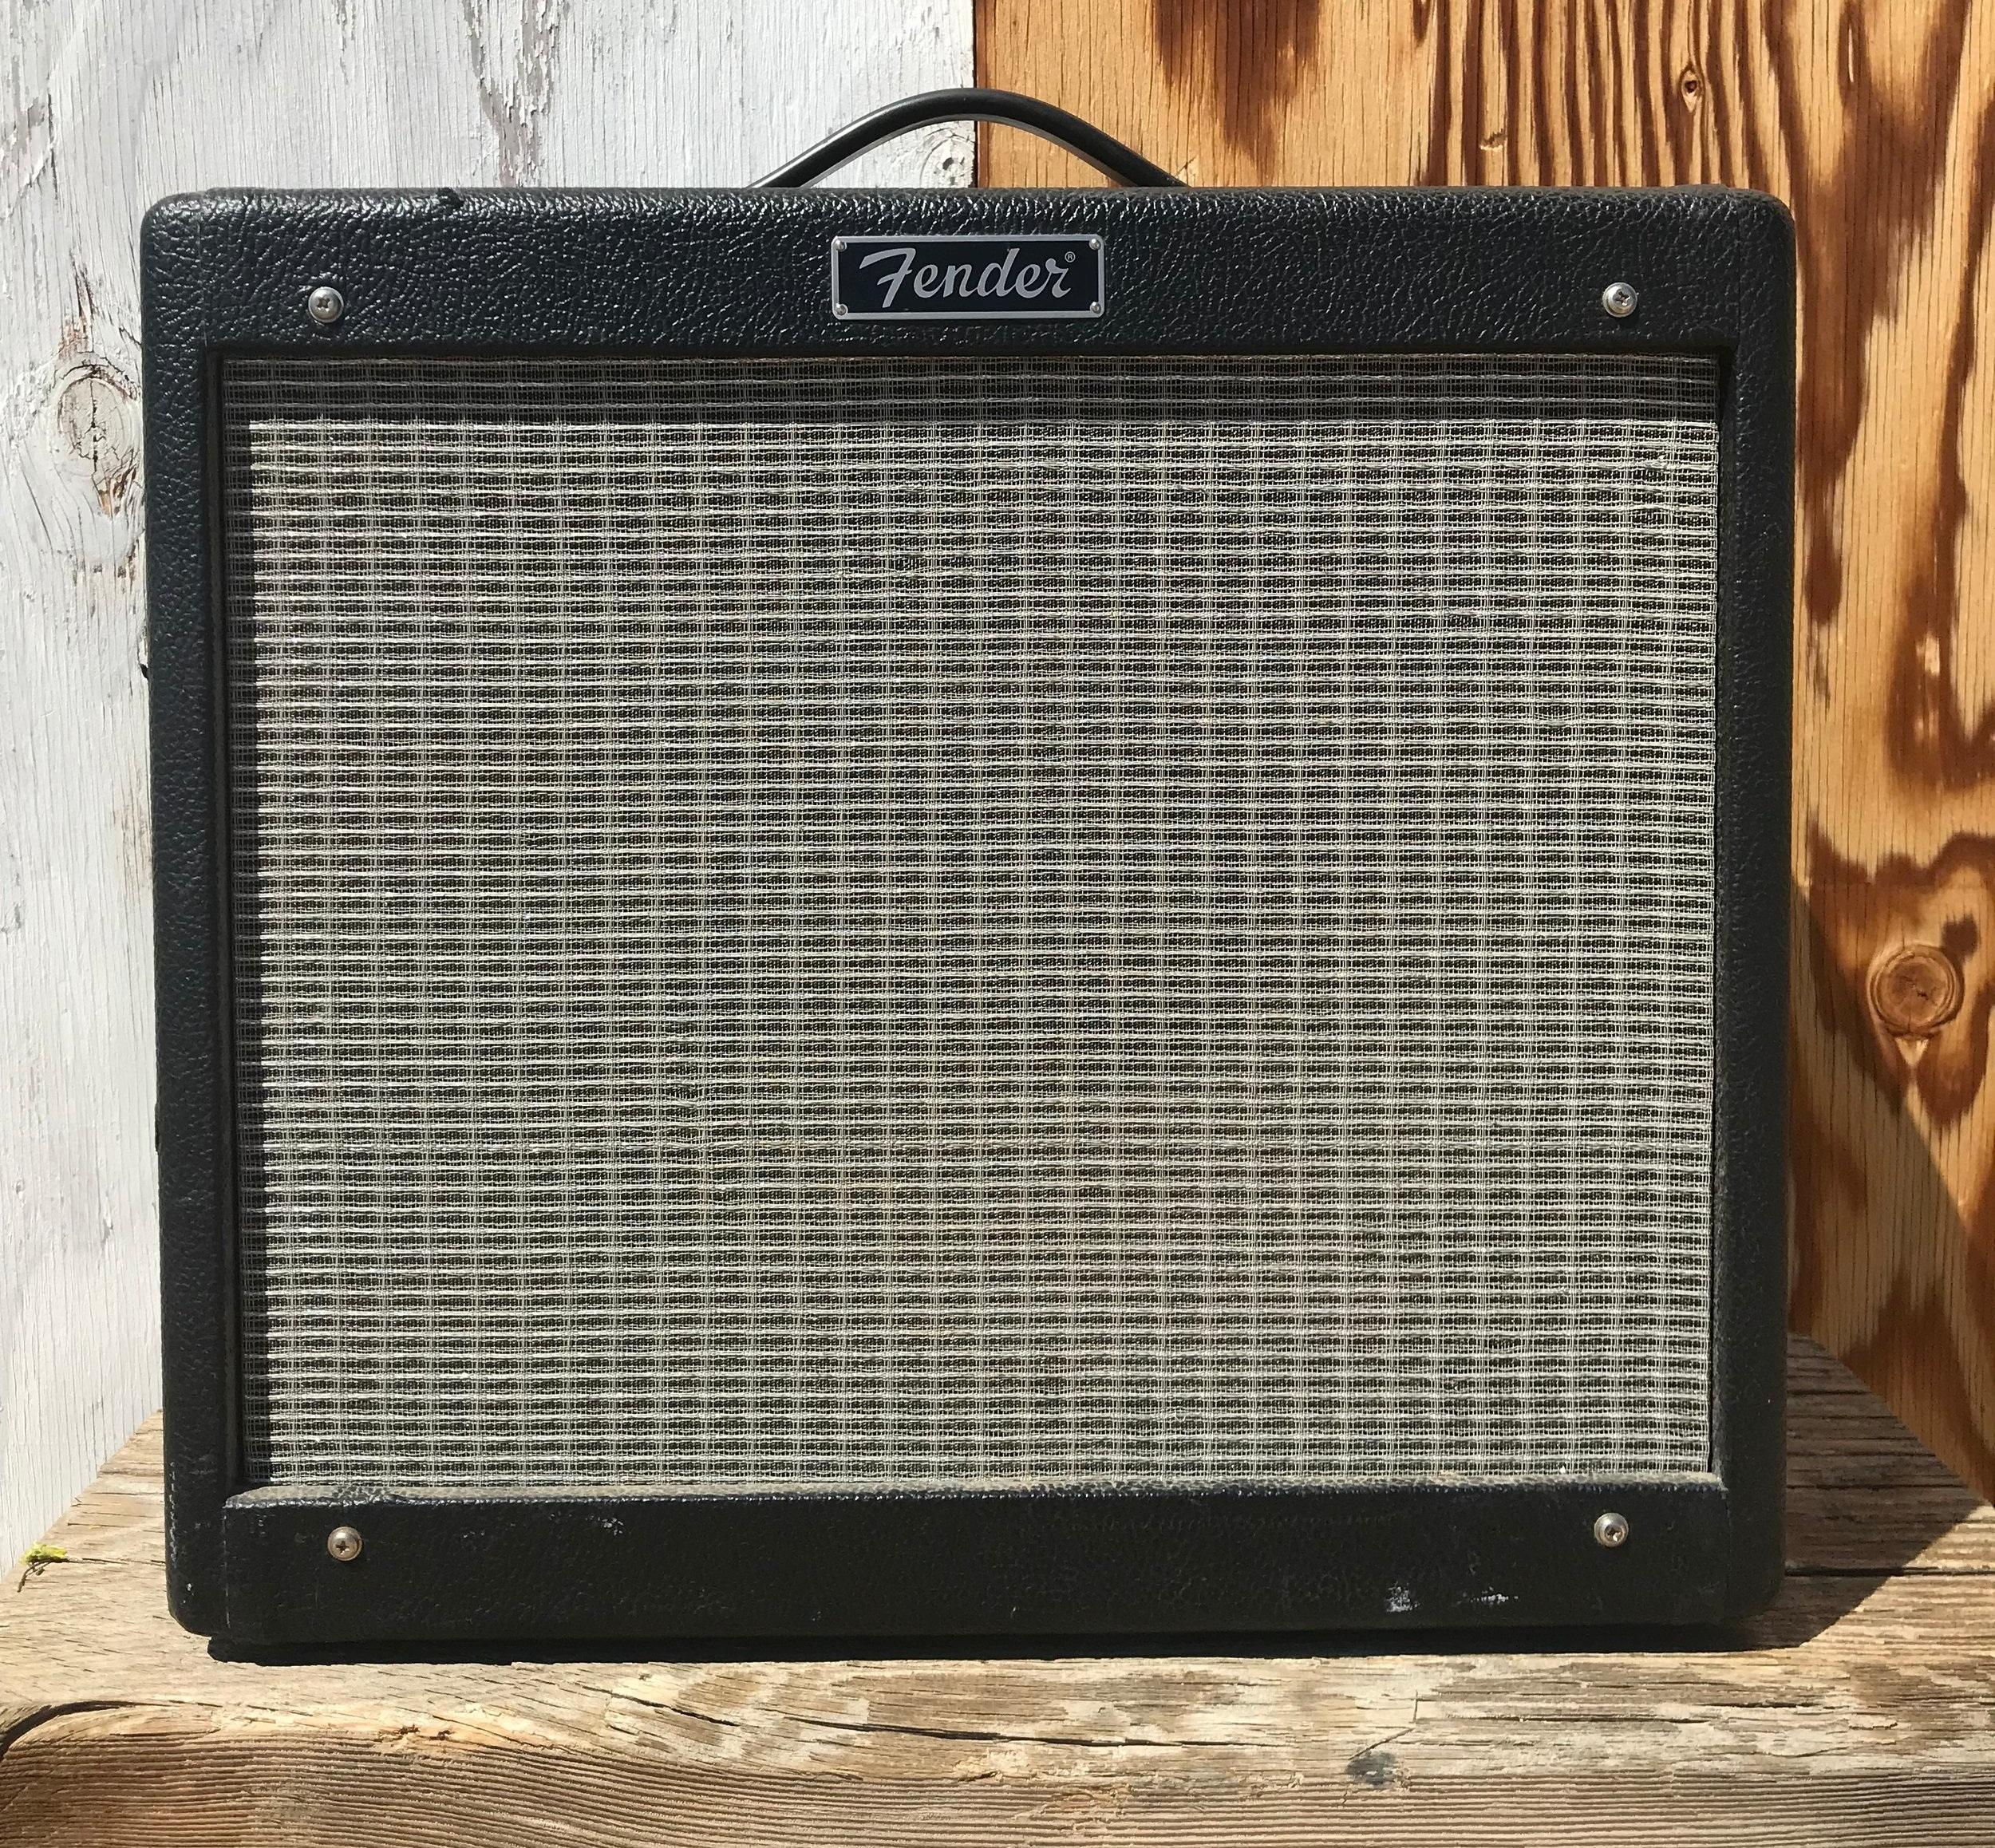 Fender Blues Jr Rebuild - When a Blues Jr dies, the blues can still live on.